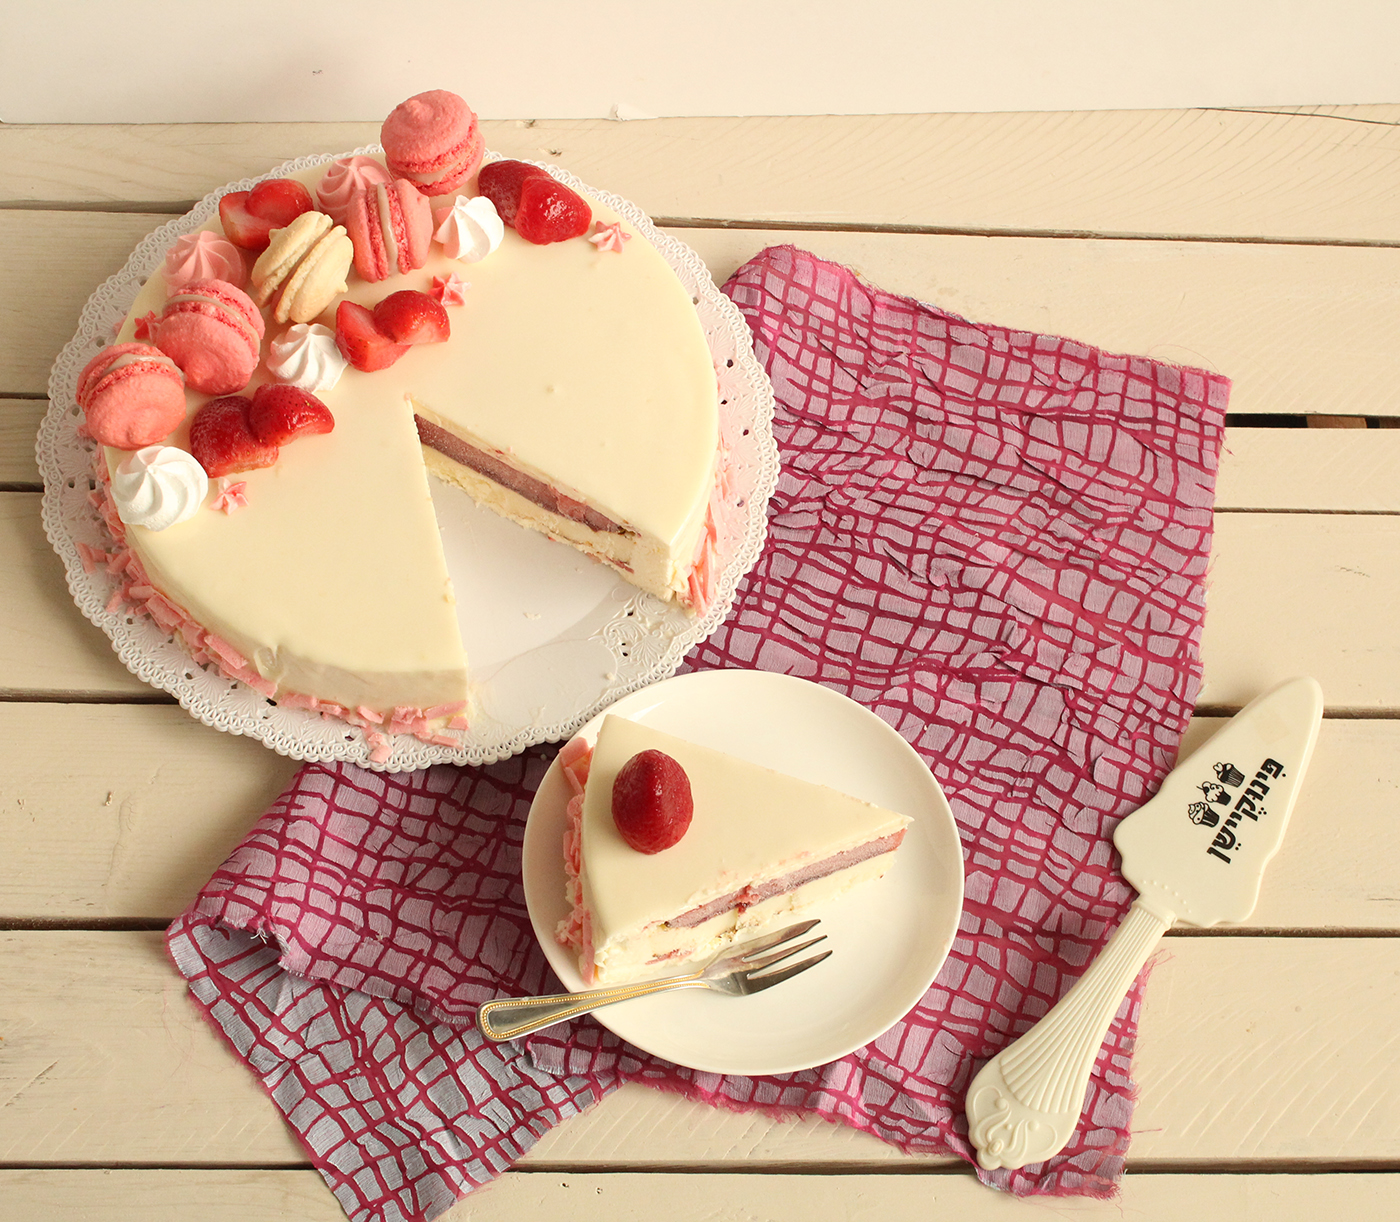 IMG 8553 - אותה גברת בשינוי אדרת :עוגת גבינה